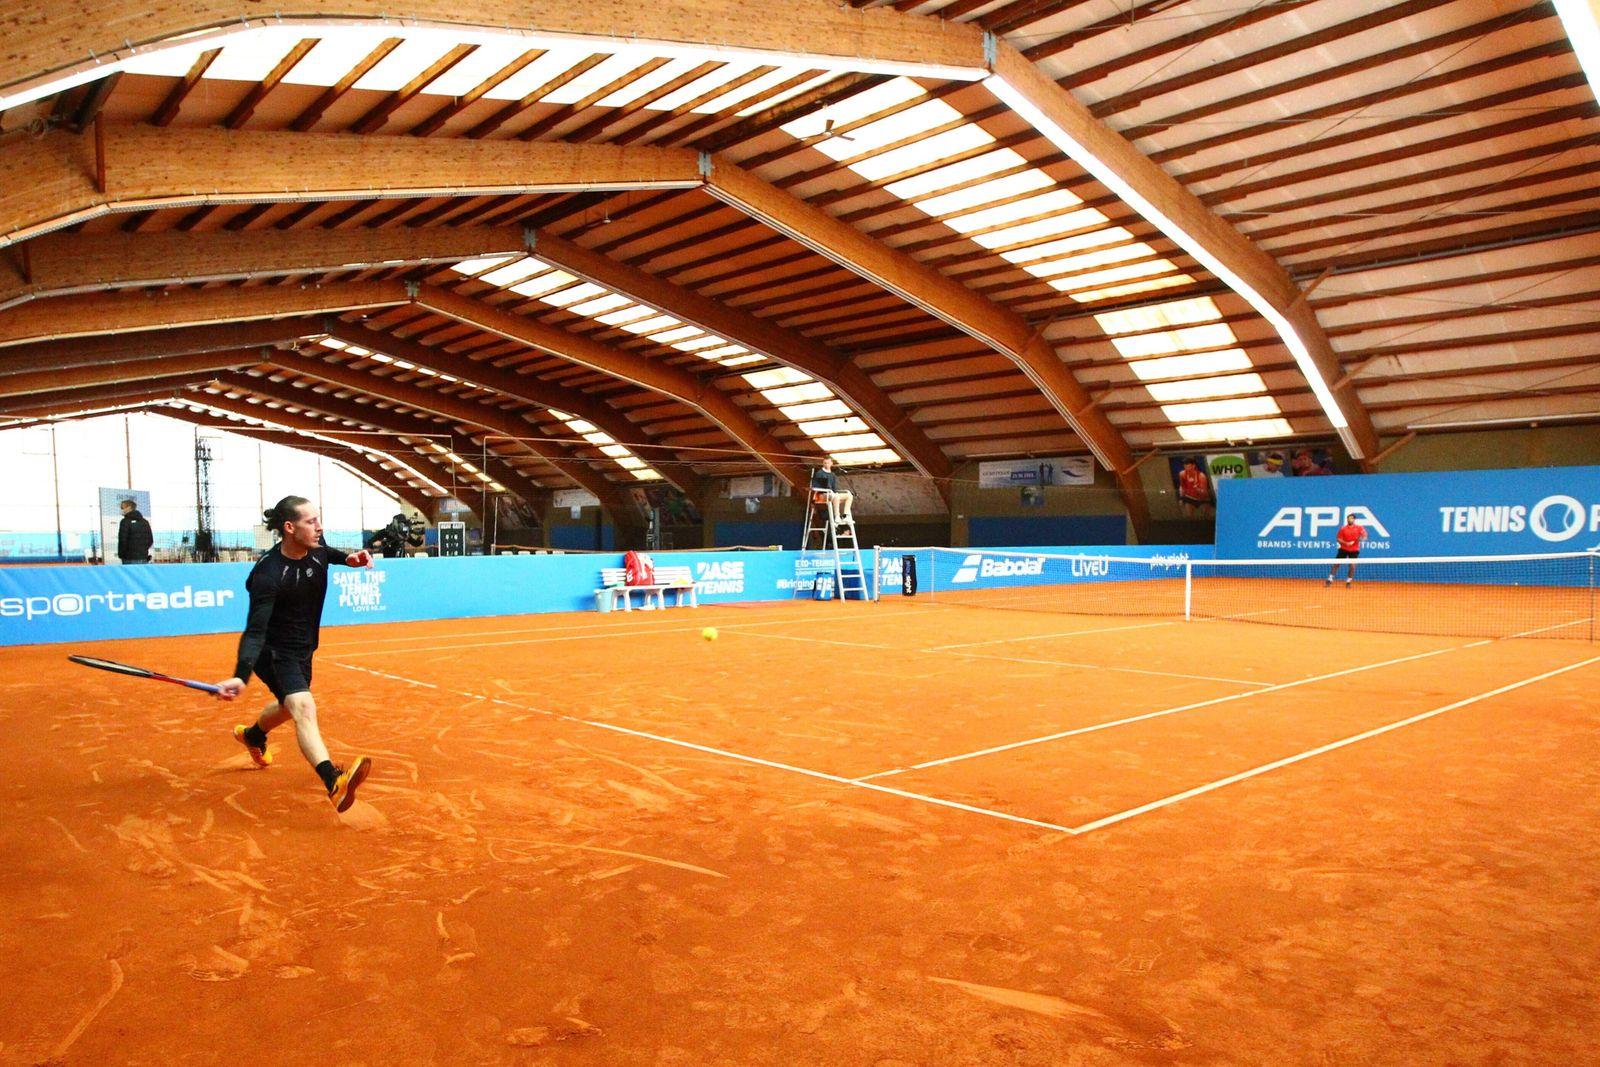 Jean Marc Werner (links) spielt bei der Tennis Exhibition Serie in Hoehr-Grenzhausen gegen Benjamin Hassan (rechts) Ten